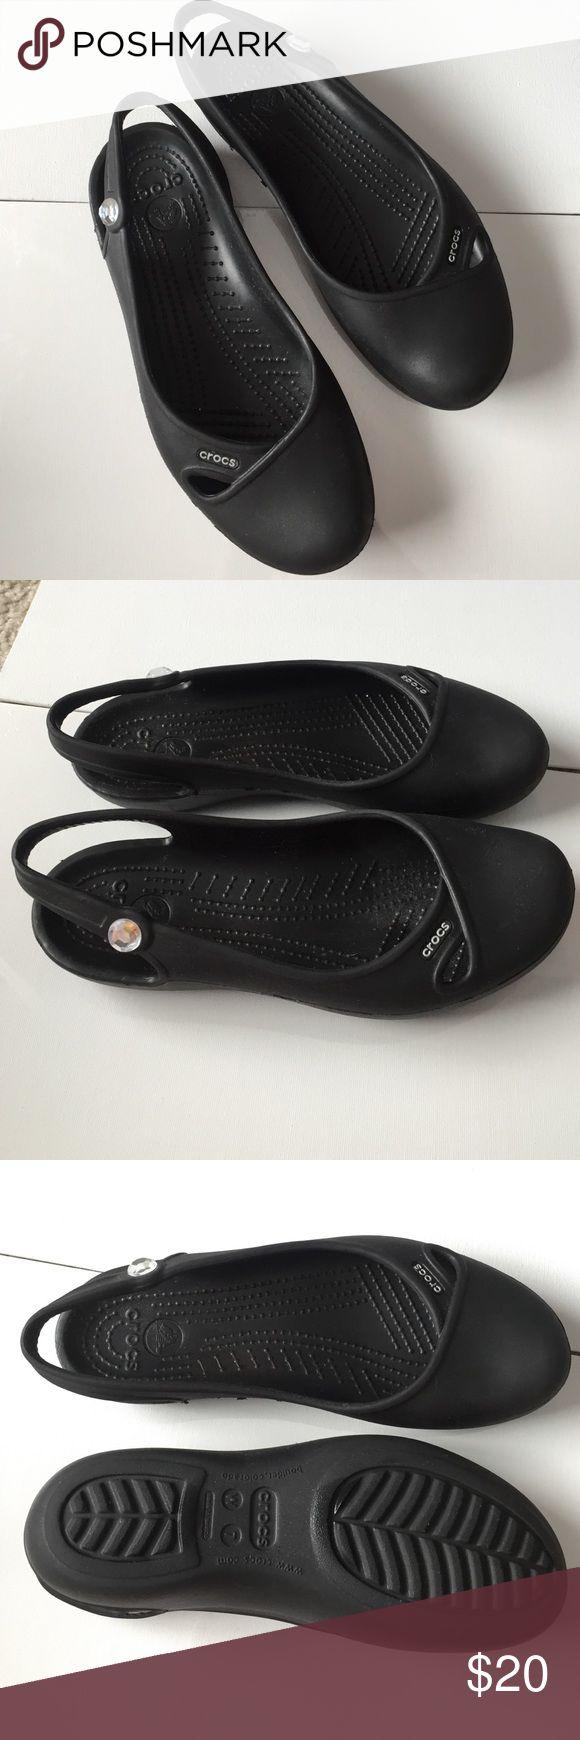 Black Sling Back Crocs Gem Stone on the side of each shoe CROCS Shoes Flats & Loafers